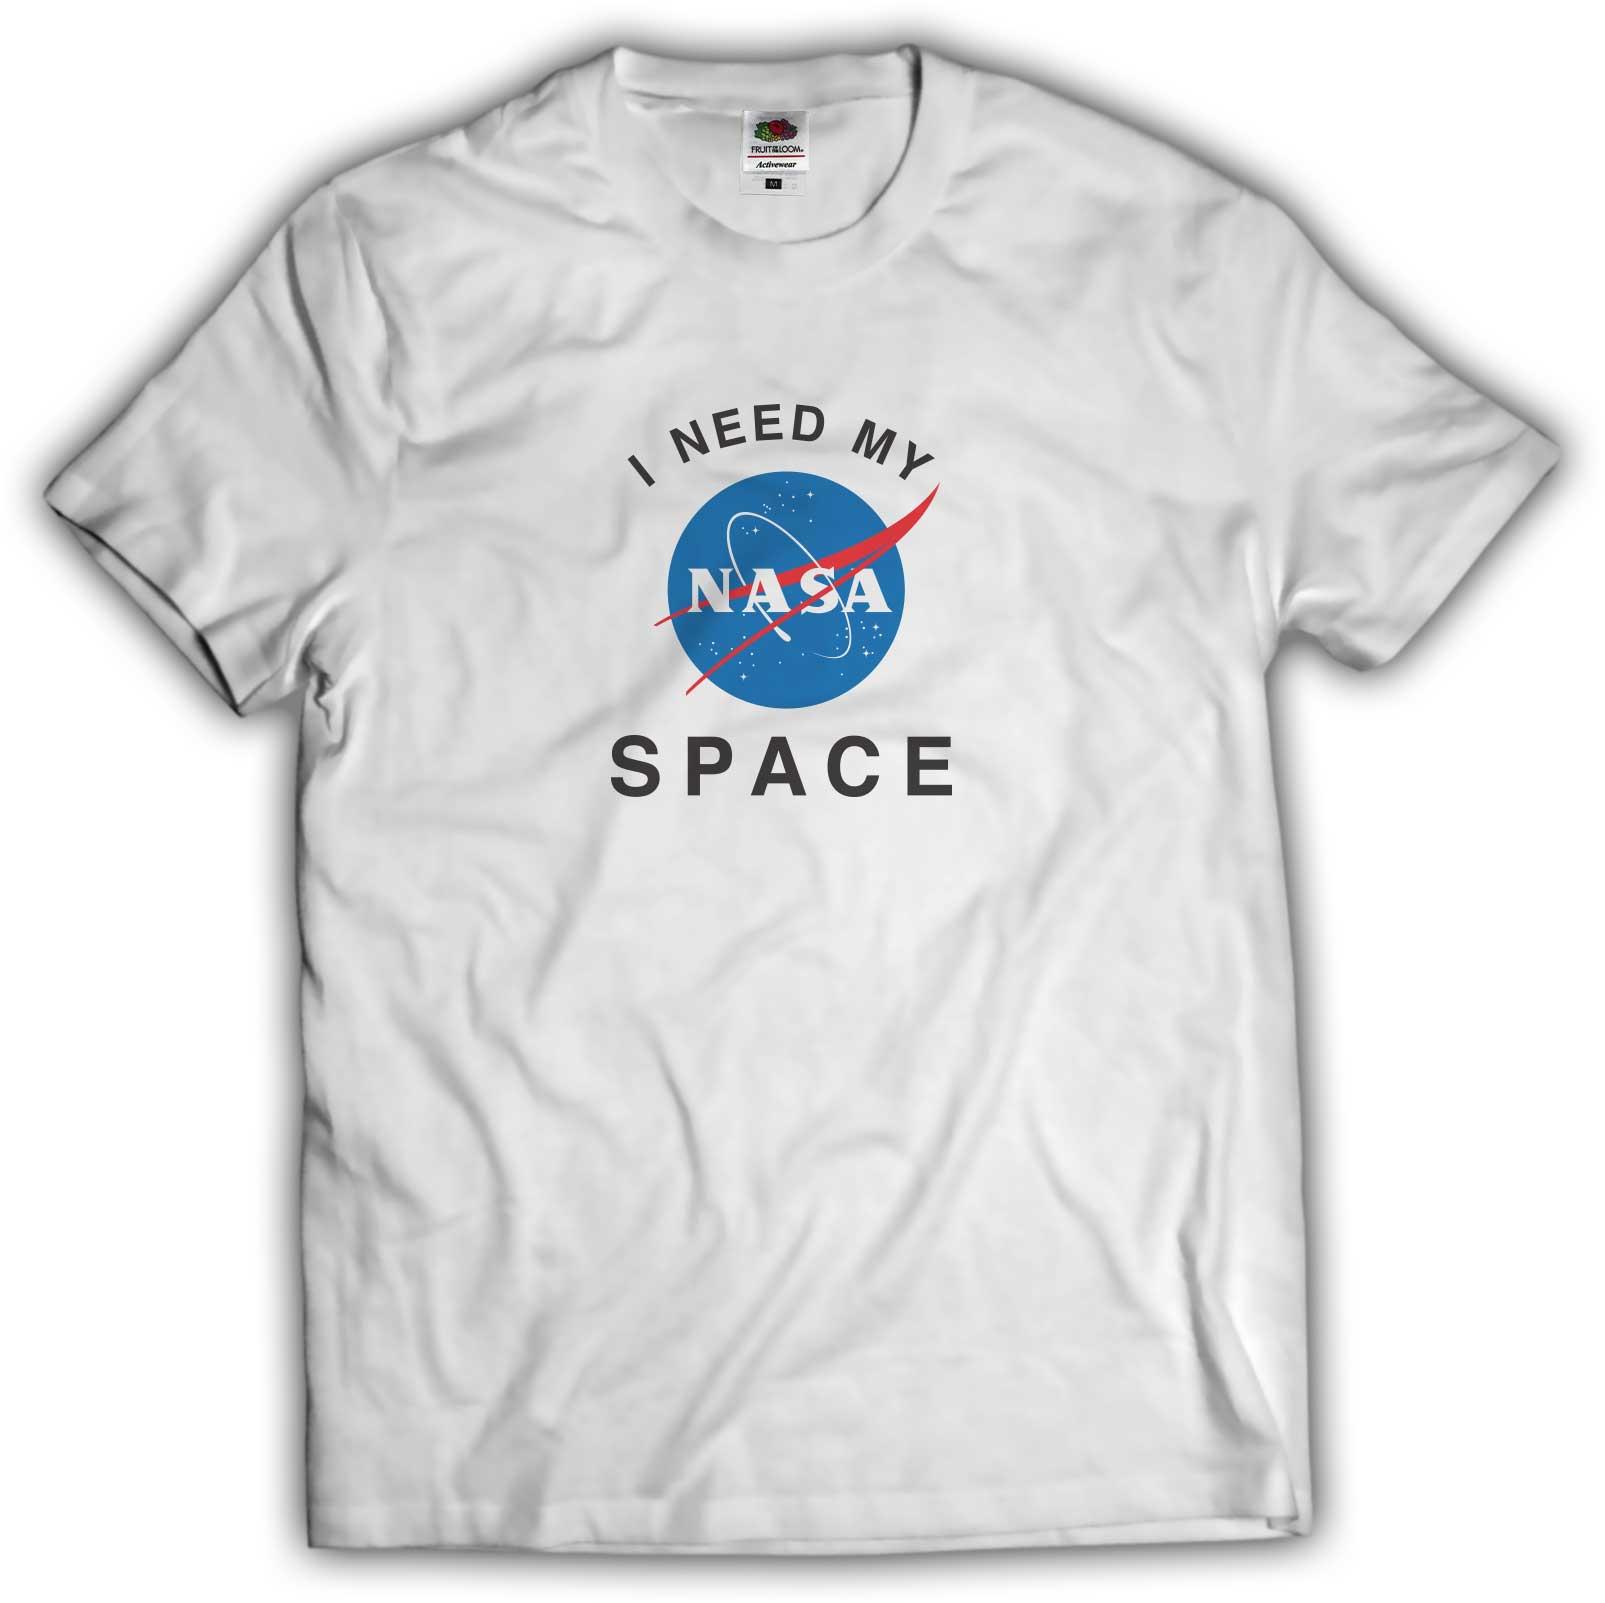 NASA公認Tシャツ(丸首)・インサイニア(ミートボール)・フルーツオブザルームボディJ3930HD